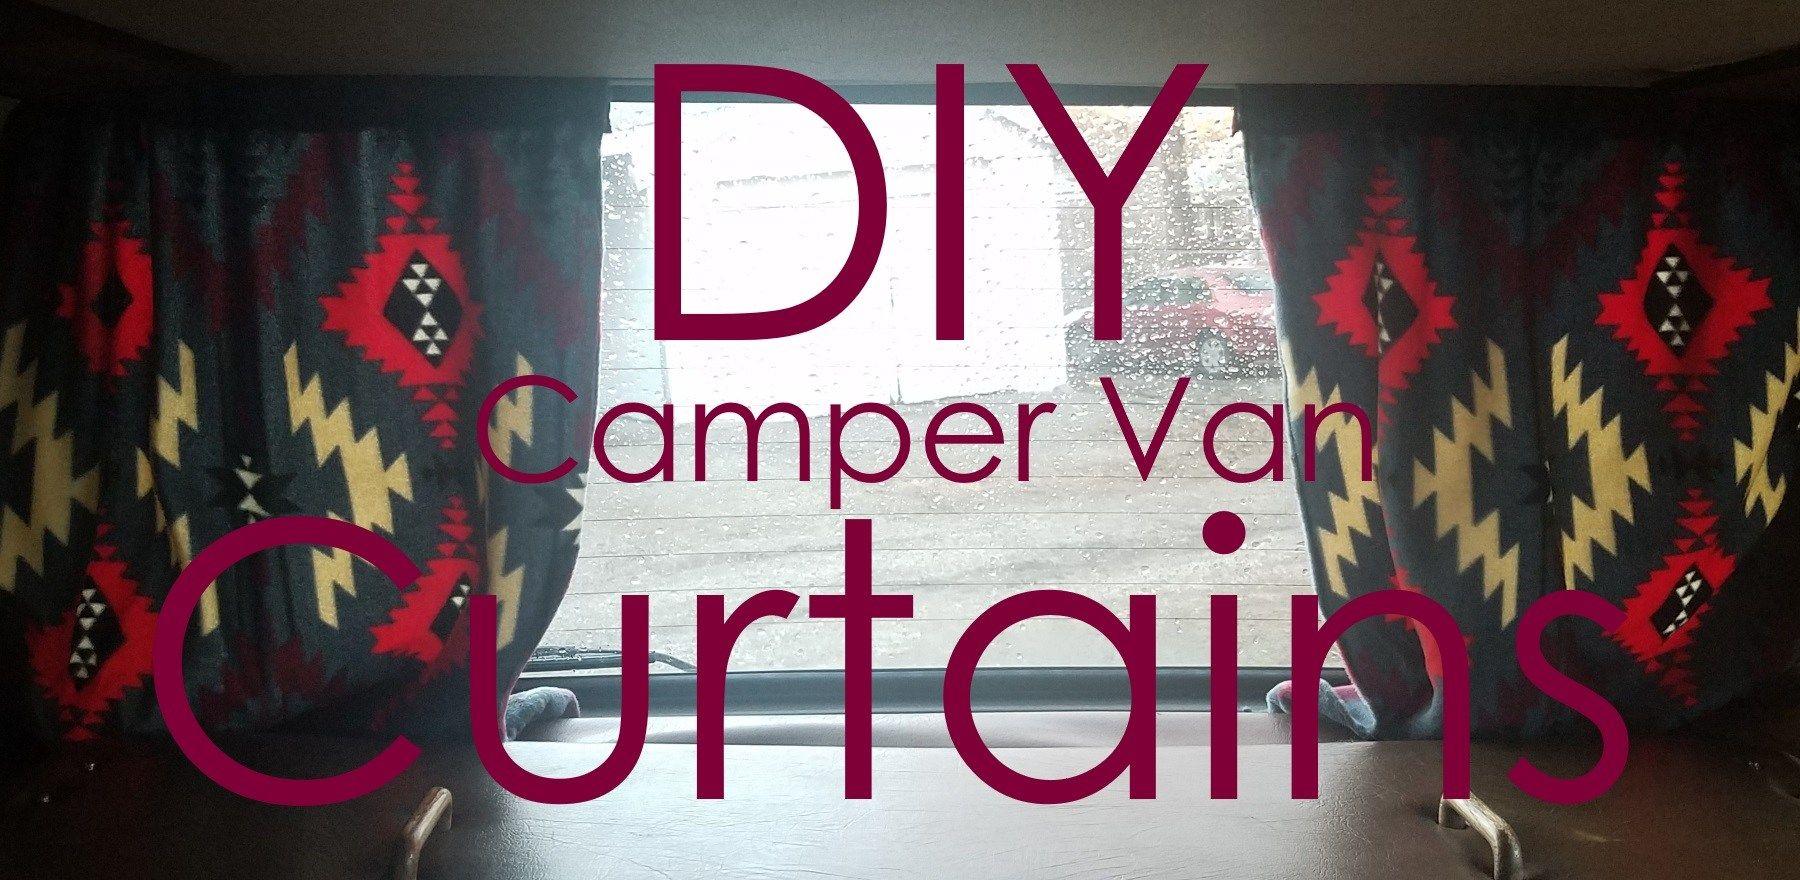 Diy curtains for your camper van kombi with haley van